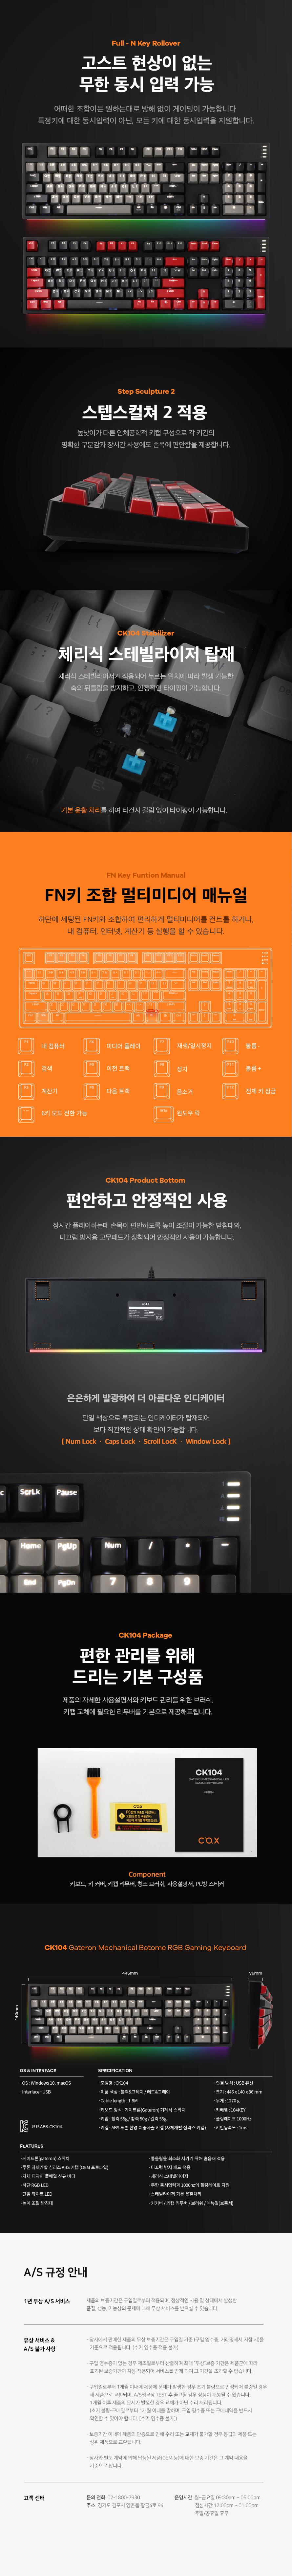 COX CK104 RGB BAR 투톤 이중사출 게이트론 기계식 (레드그레이, 청축)